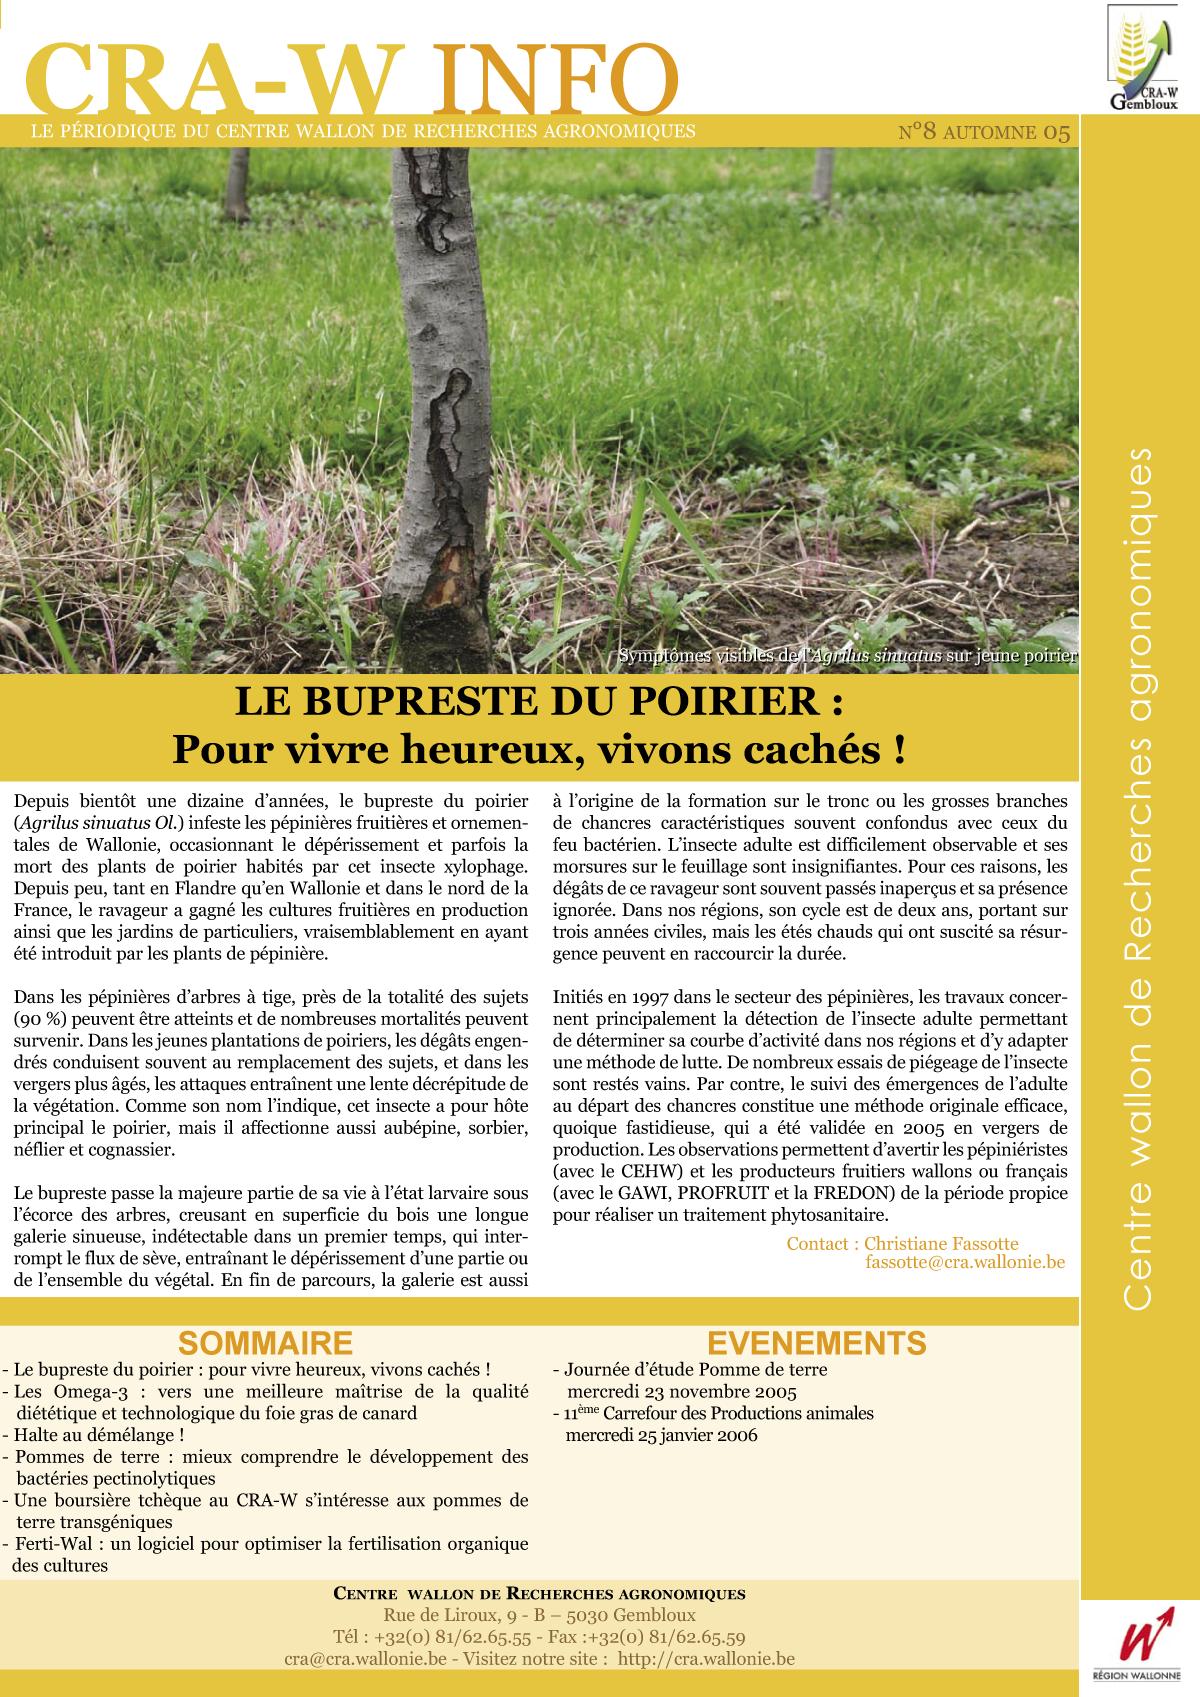 CRAW info n° 8